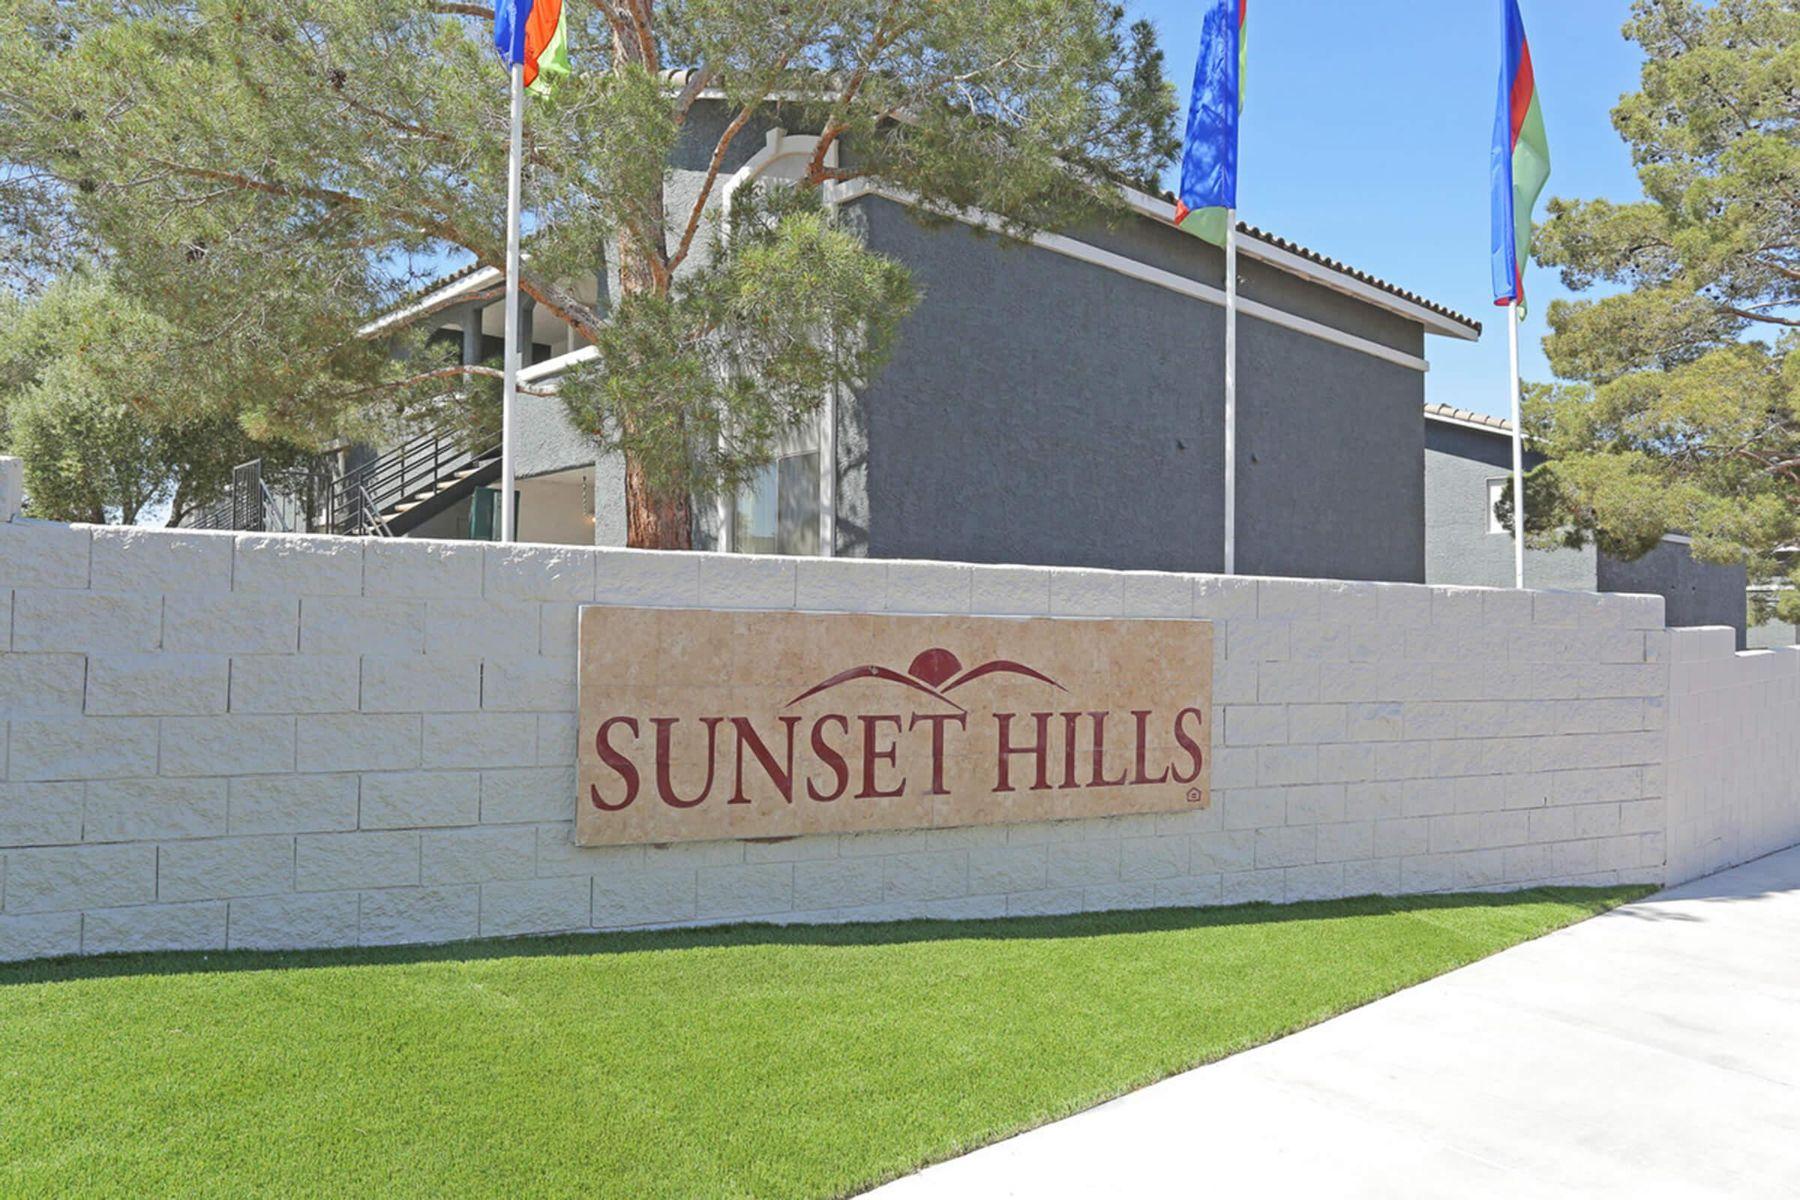 sunset-hills-apartments-henderson-nv-sunset-hills.jpg